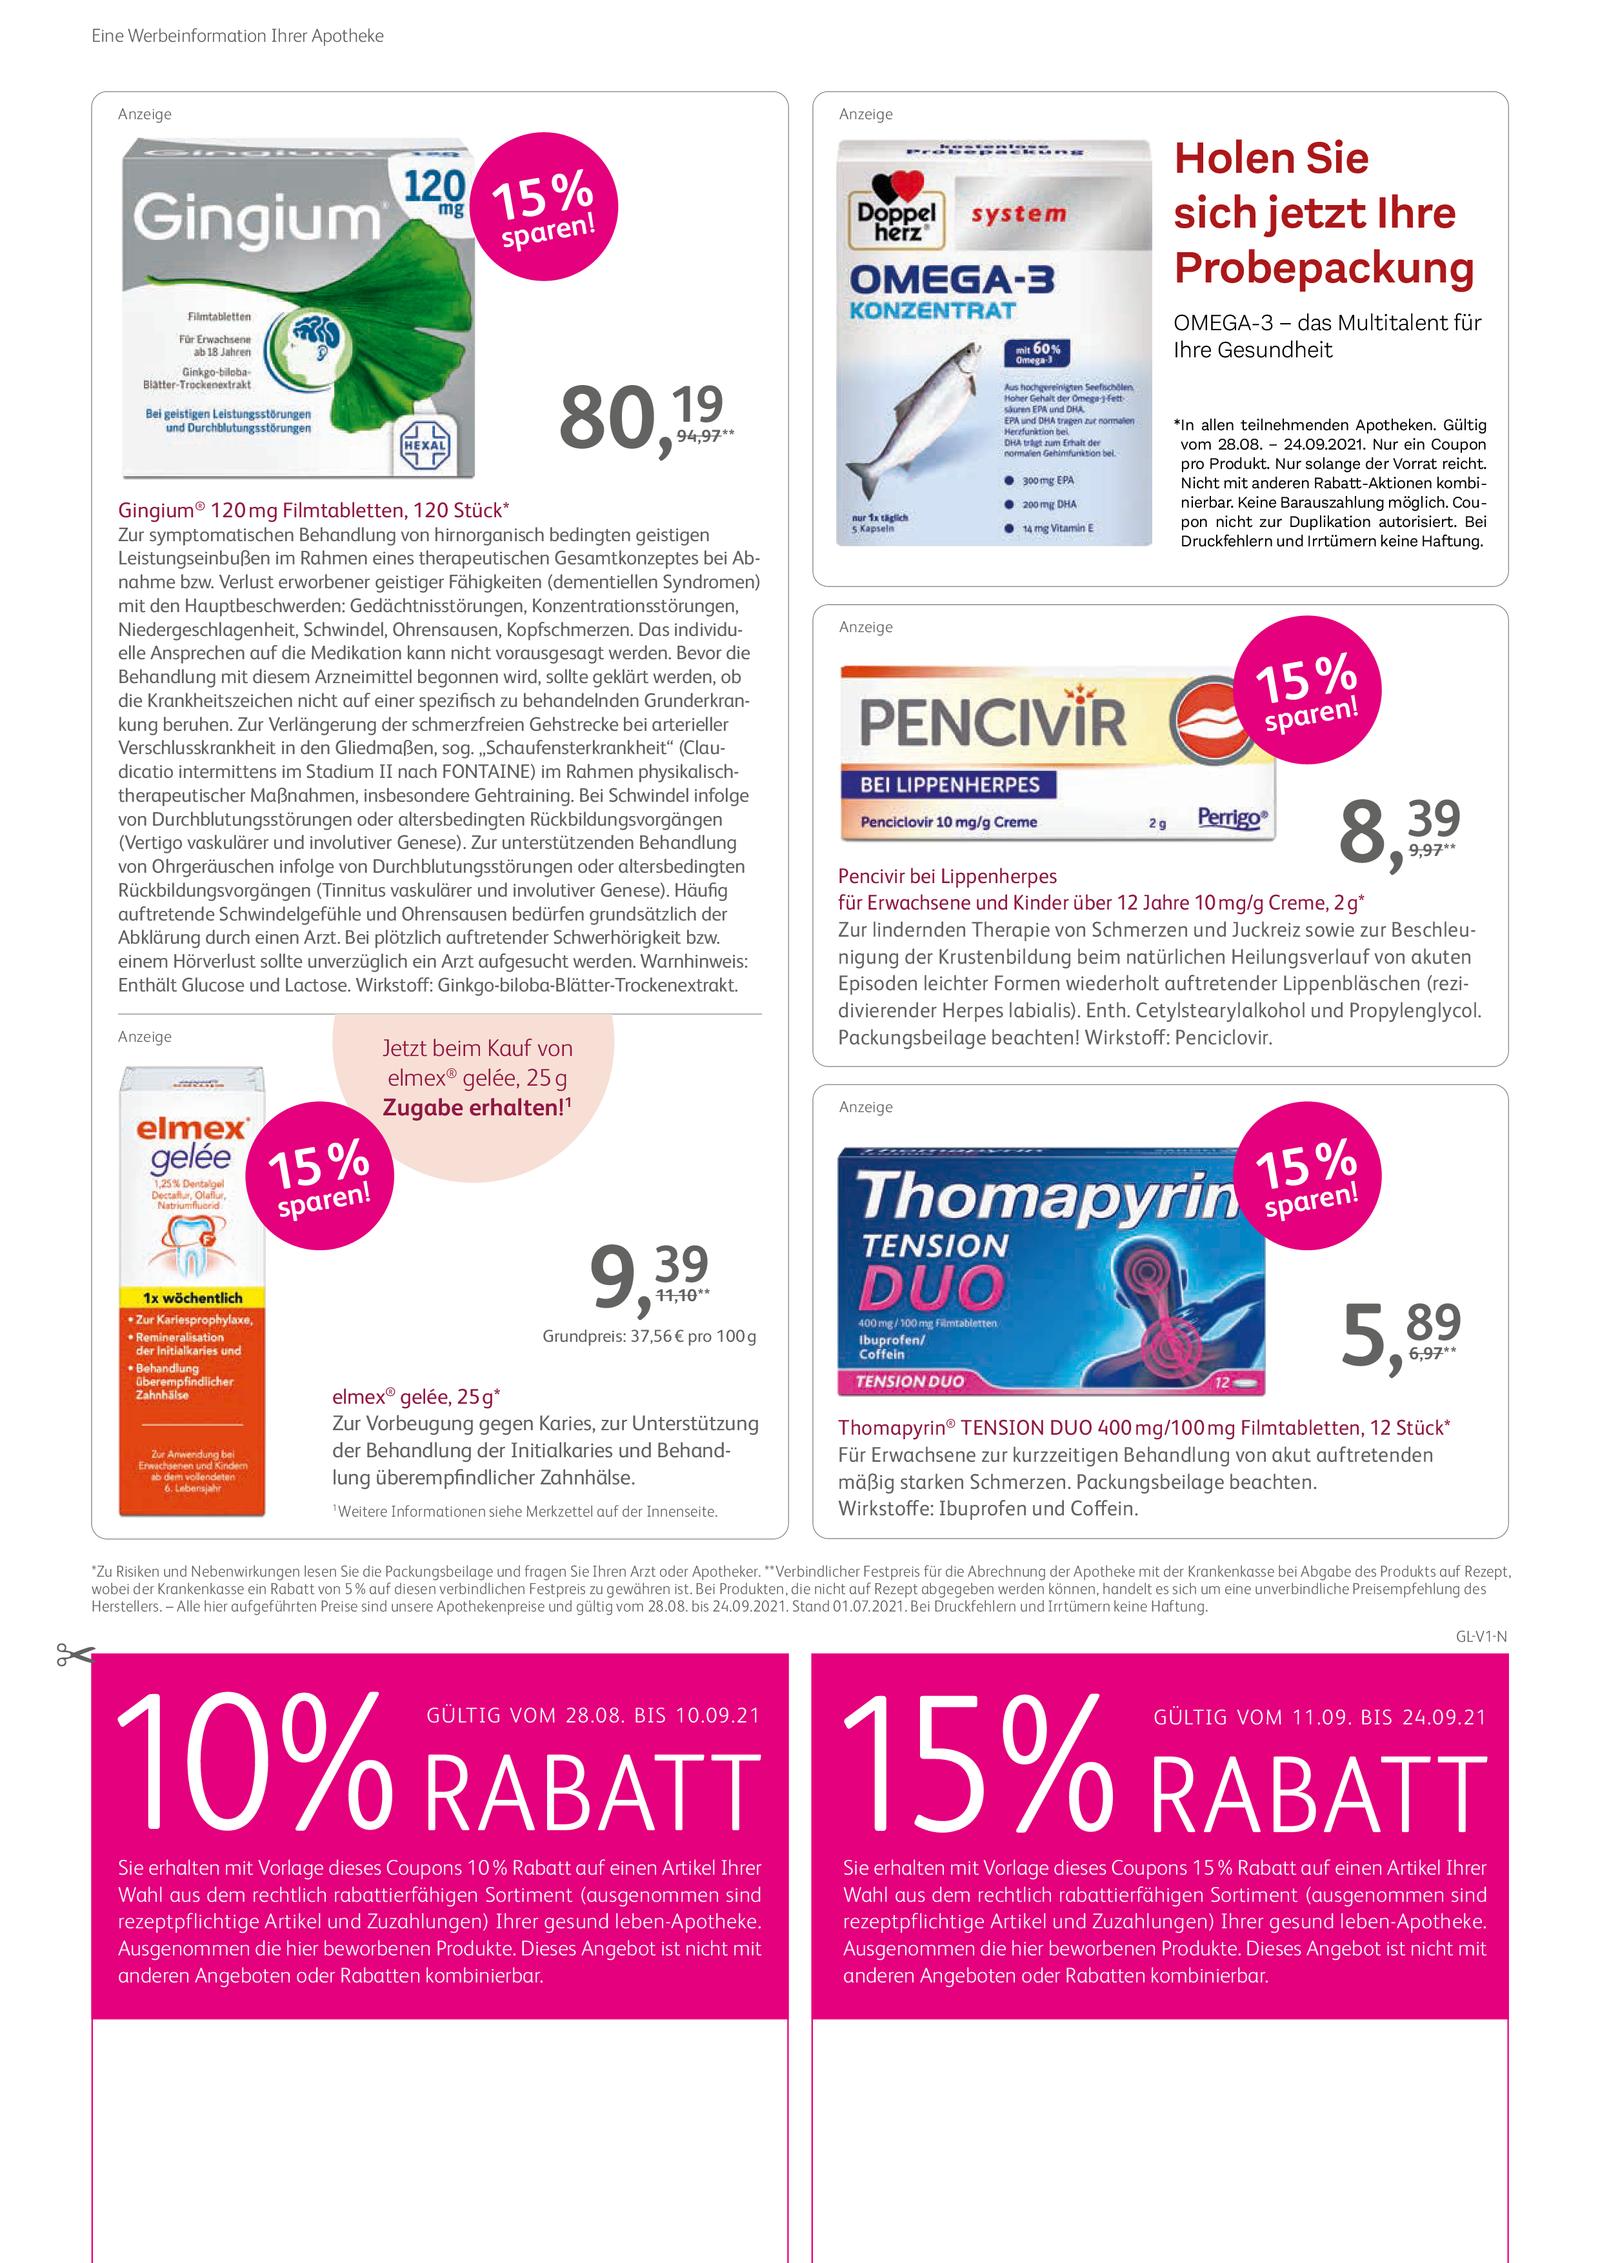 https://mein-uploads.apocdn.net/15913/leaflets/gesundleben_niedrig-Seite4.png